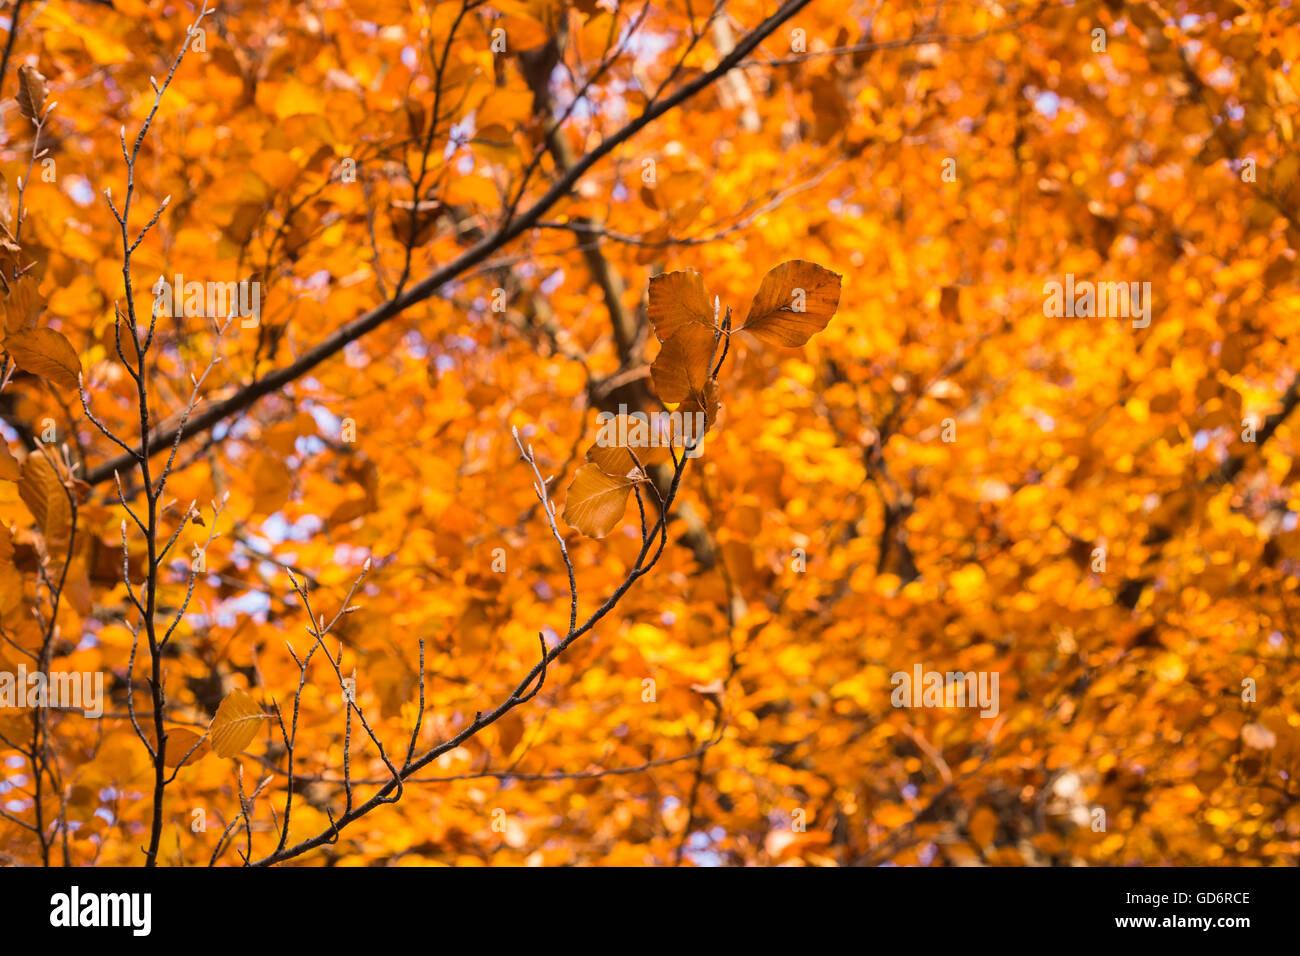 Colorful autumn tree - Stock Image